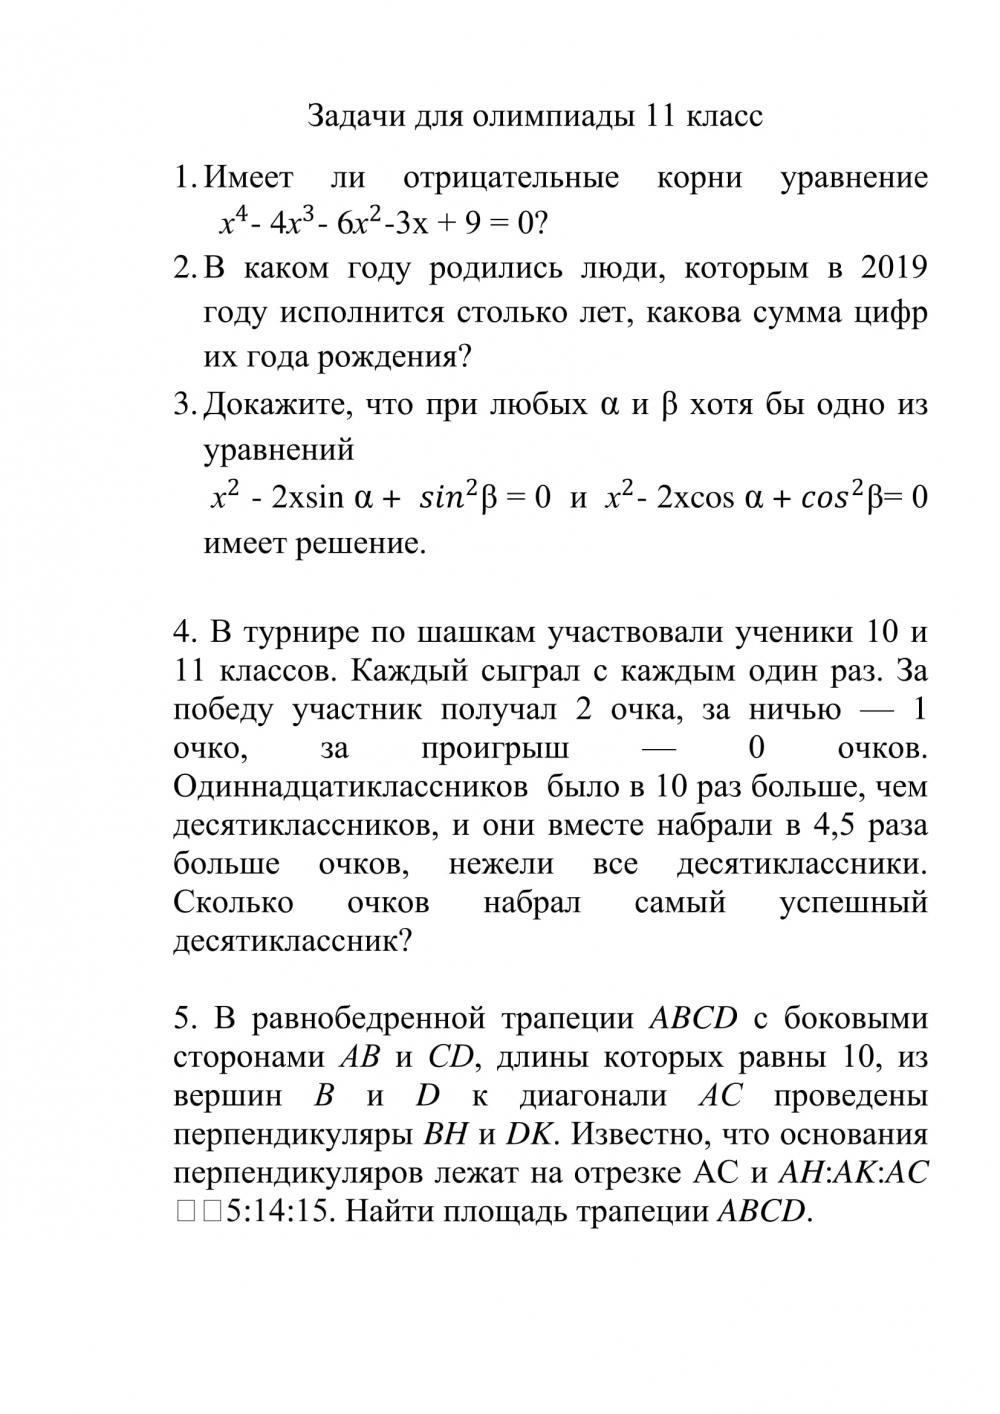 какие задачи решил венский конгресс